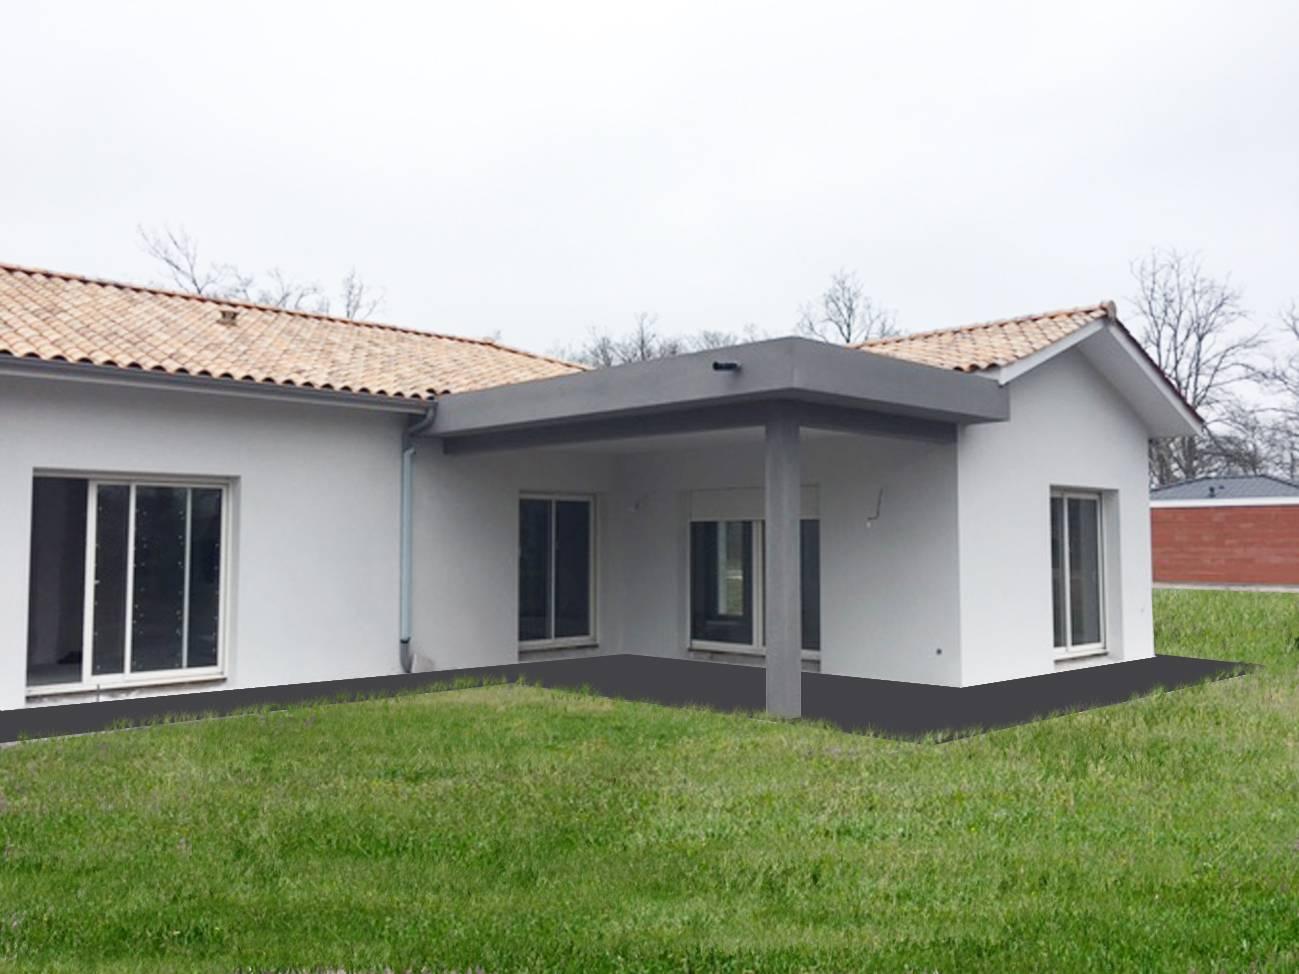 Maison individuelle plein pied gironde constructeur de for Tarif constructeur maison individuelle